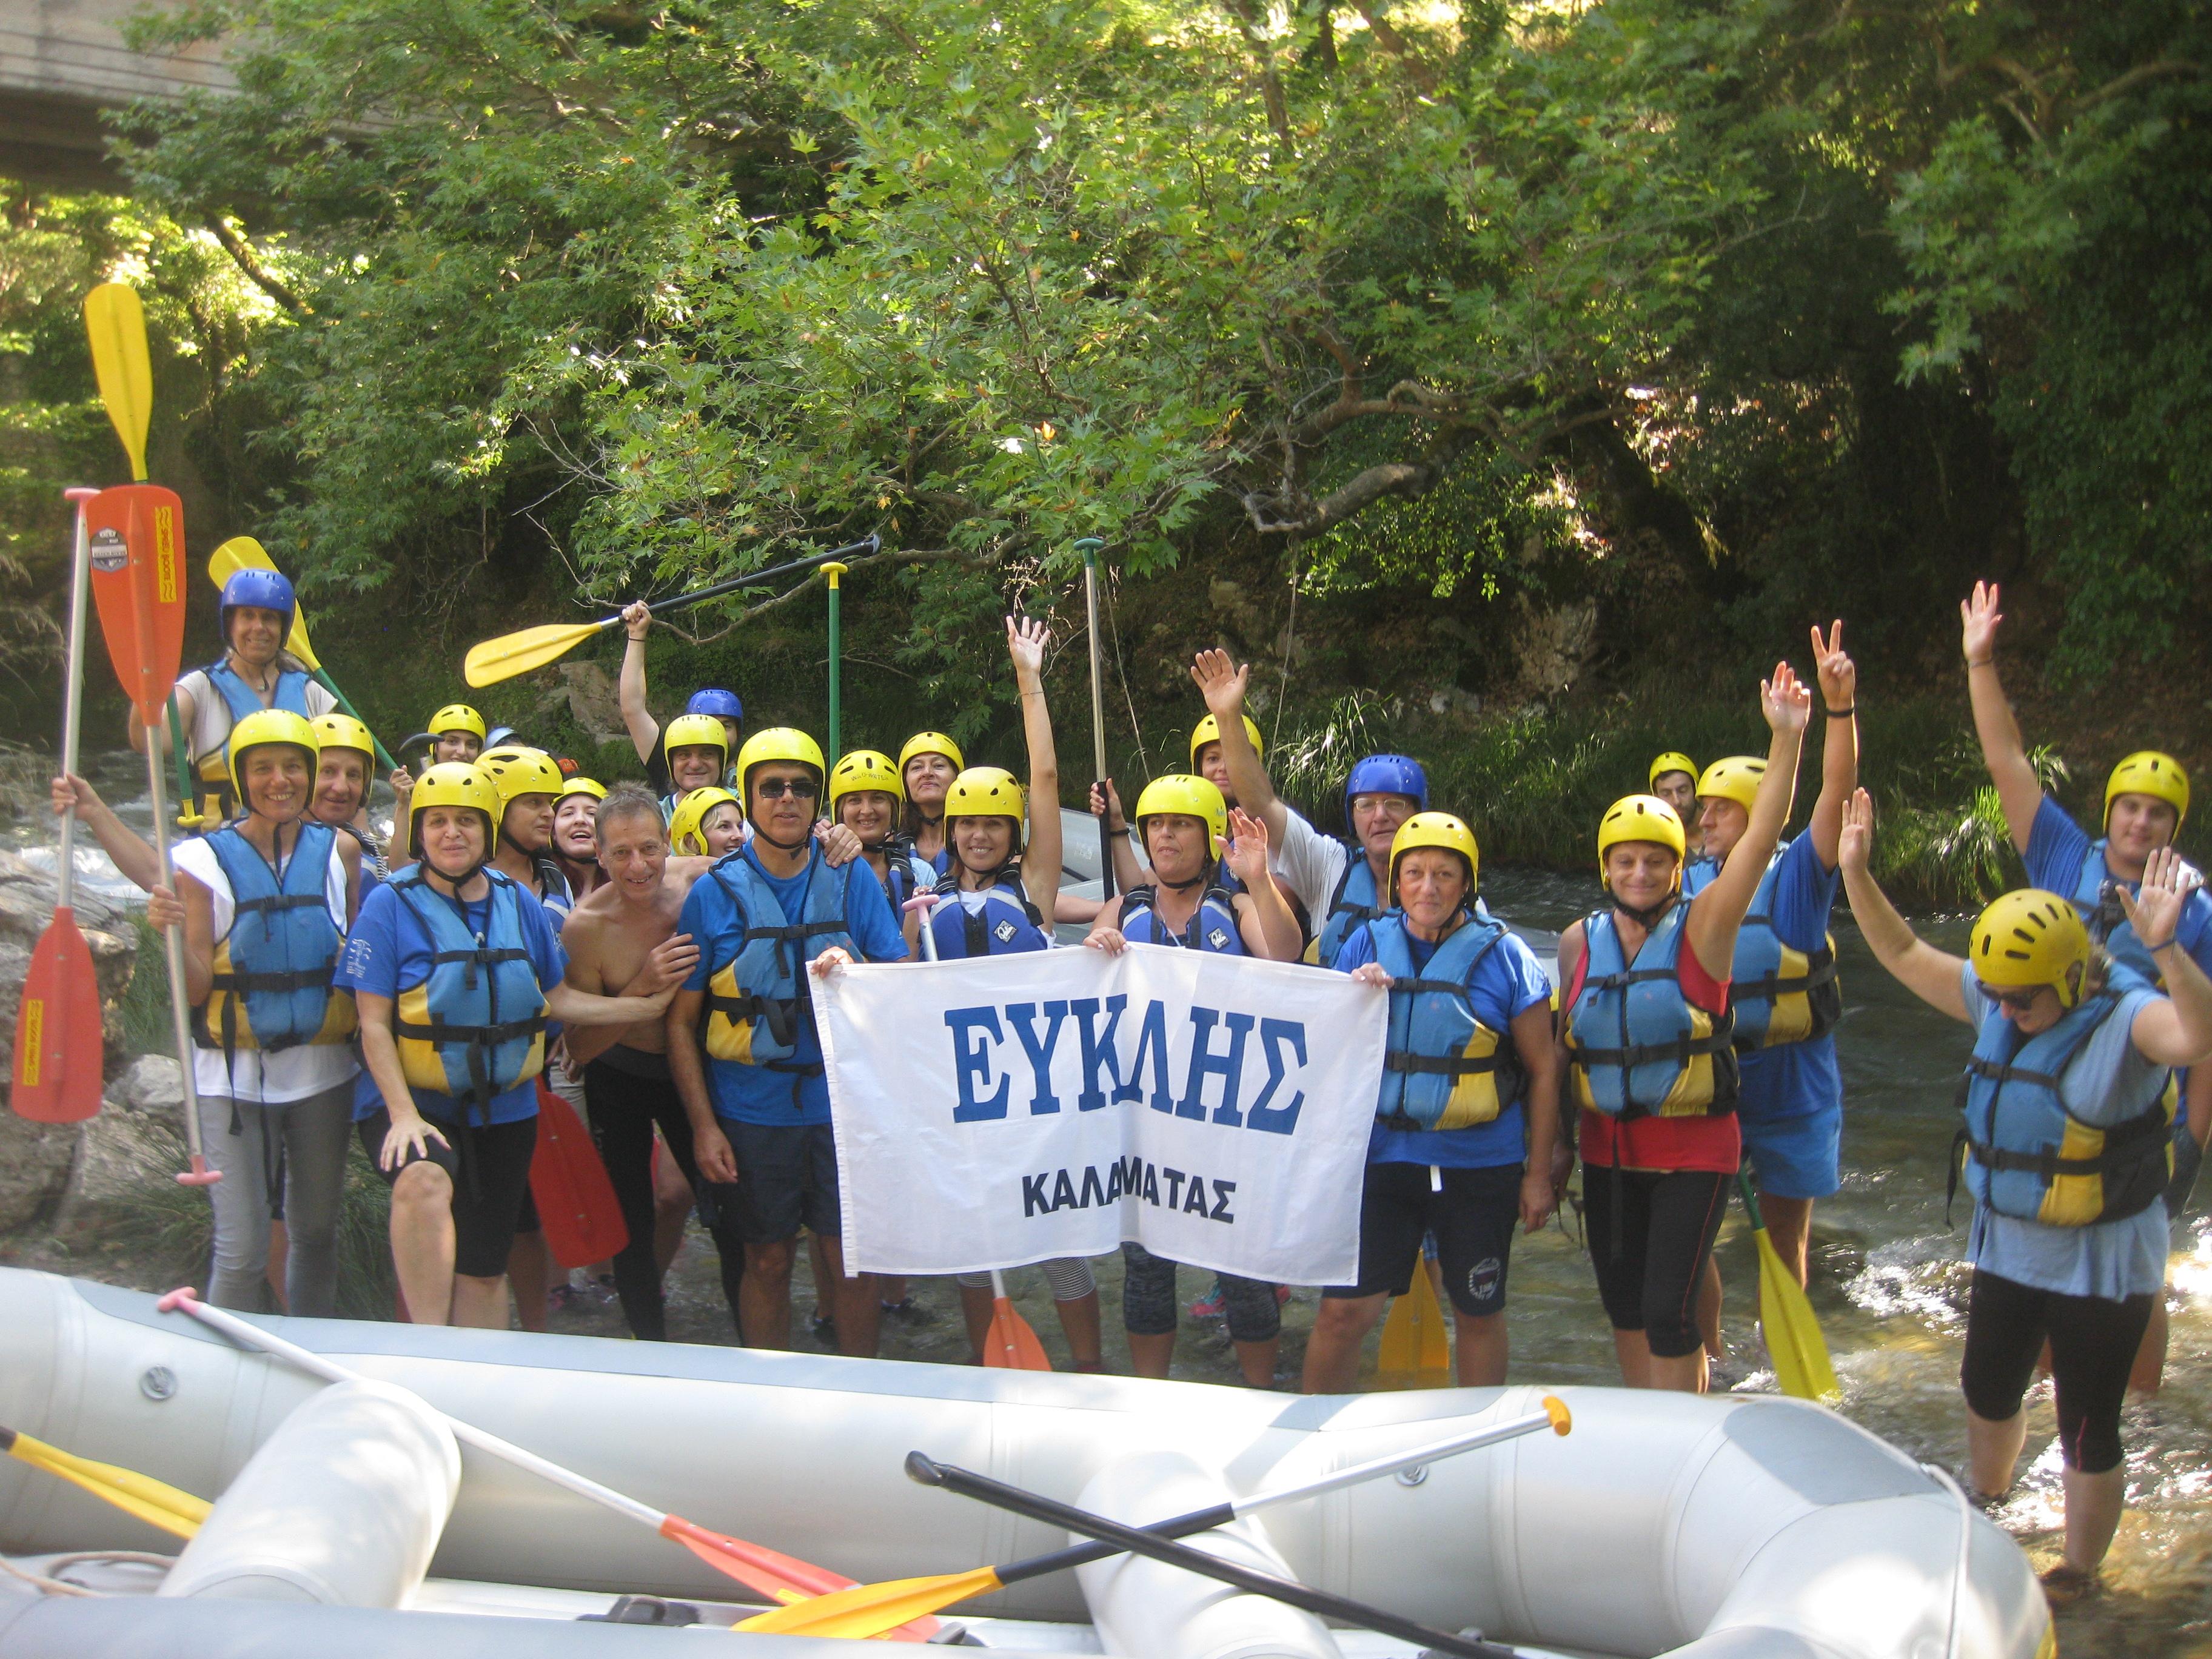 Rafting στον Λούσιο ποταμό για τους λάτρεις της φύσης του Ευκλή